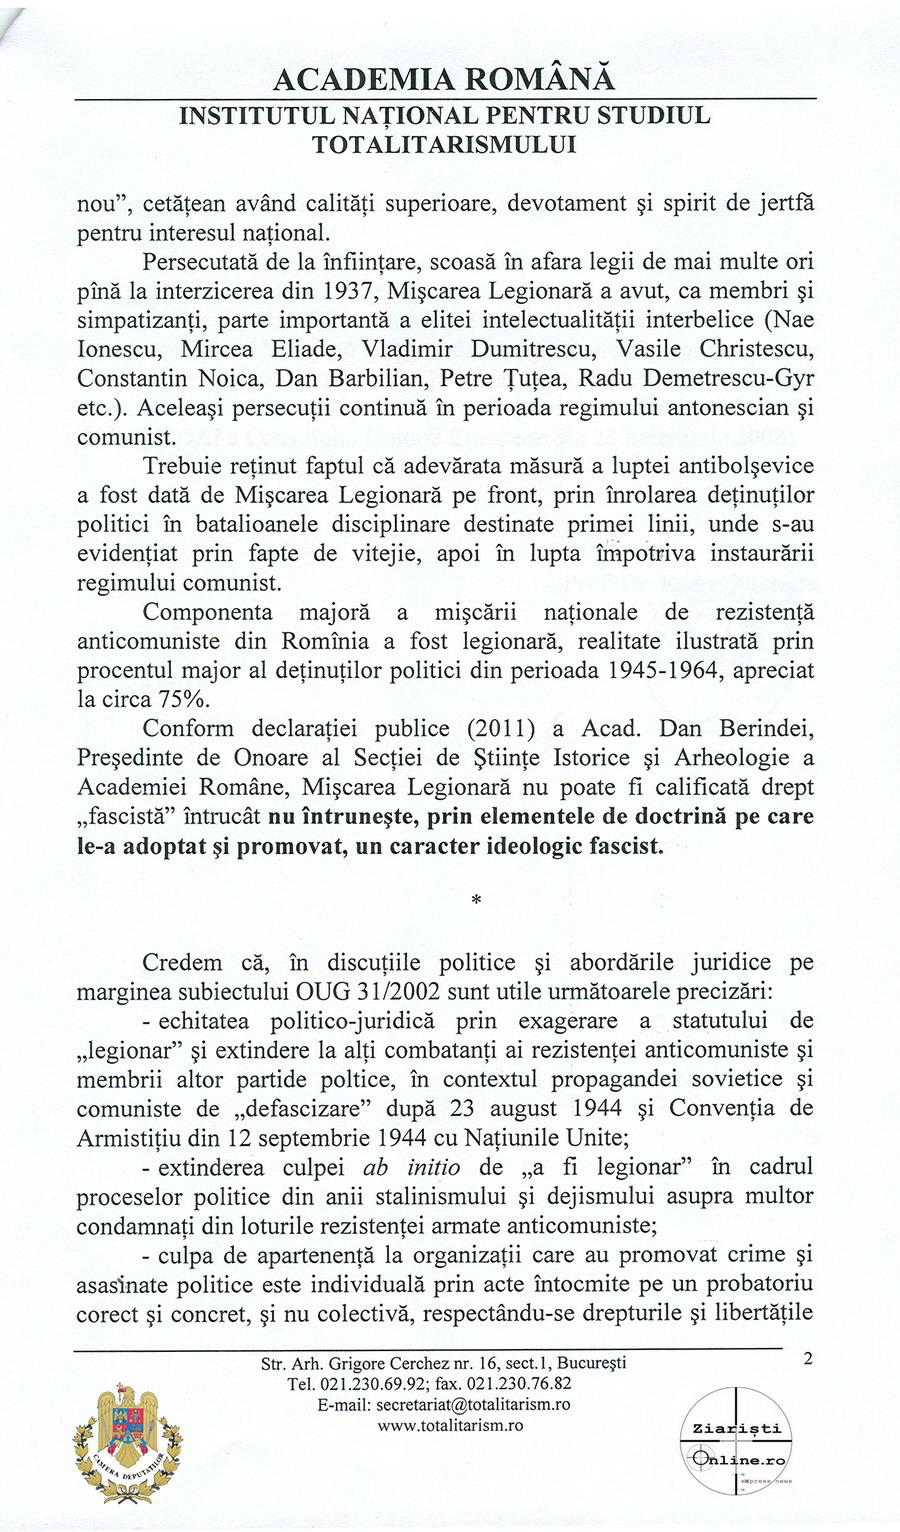 Academia-Romana-INST-despre-Miscarea-Legionara-02-Iunie-2015-Camera-Deputatilor-Ziaristi-Online